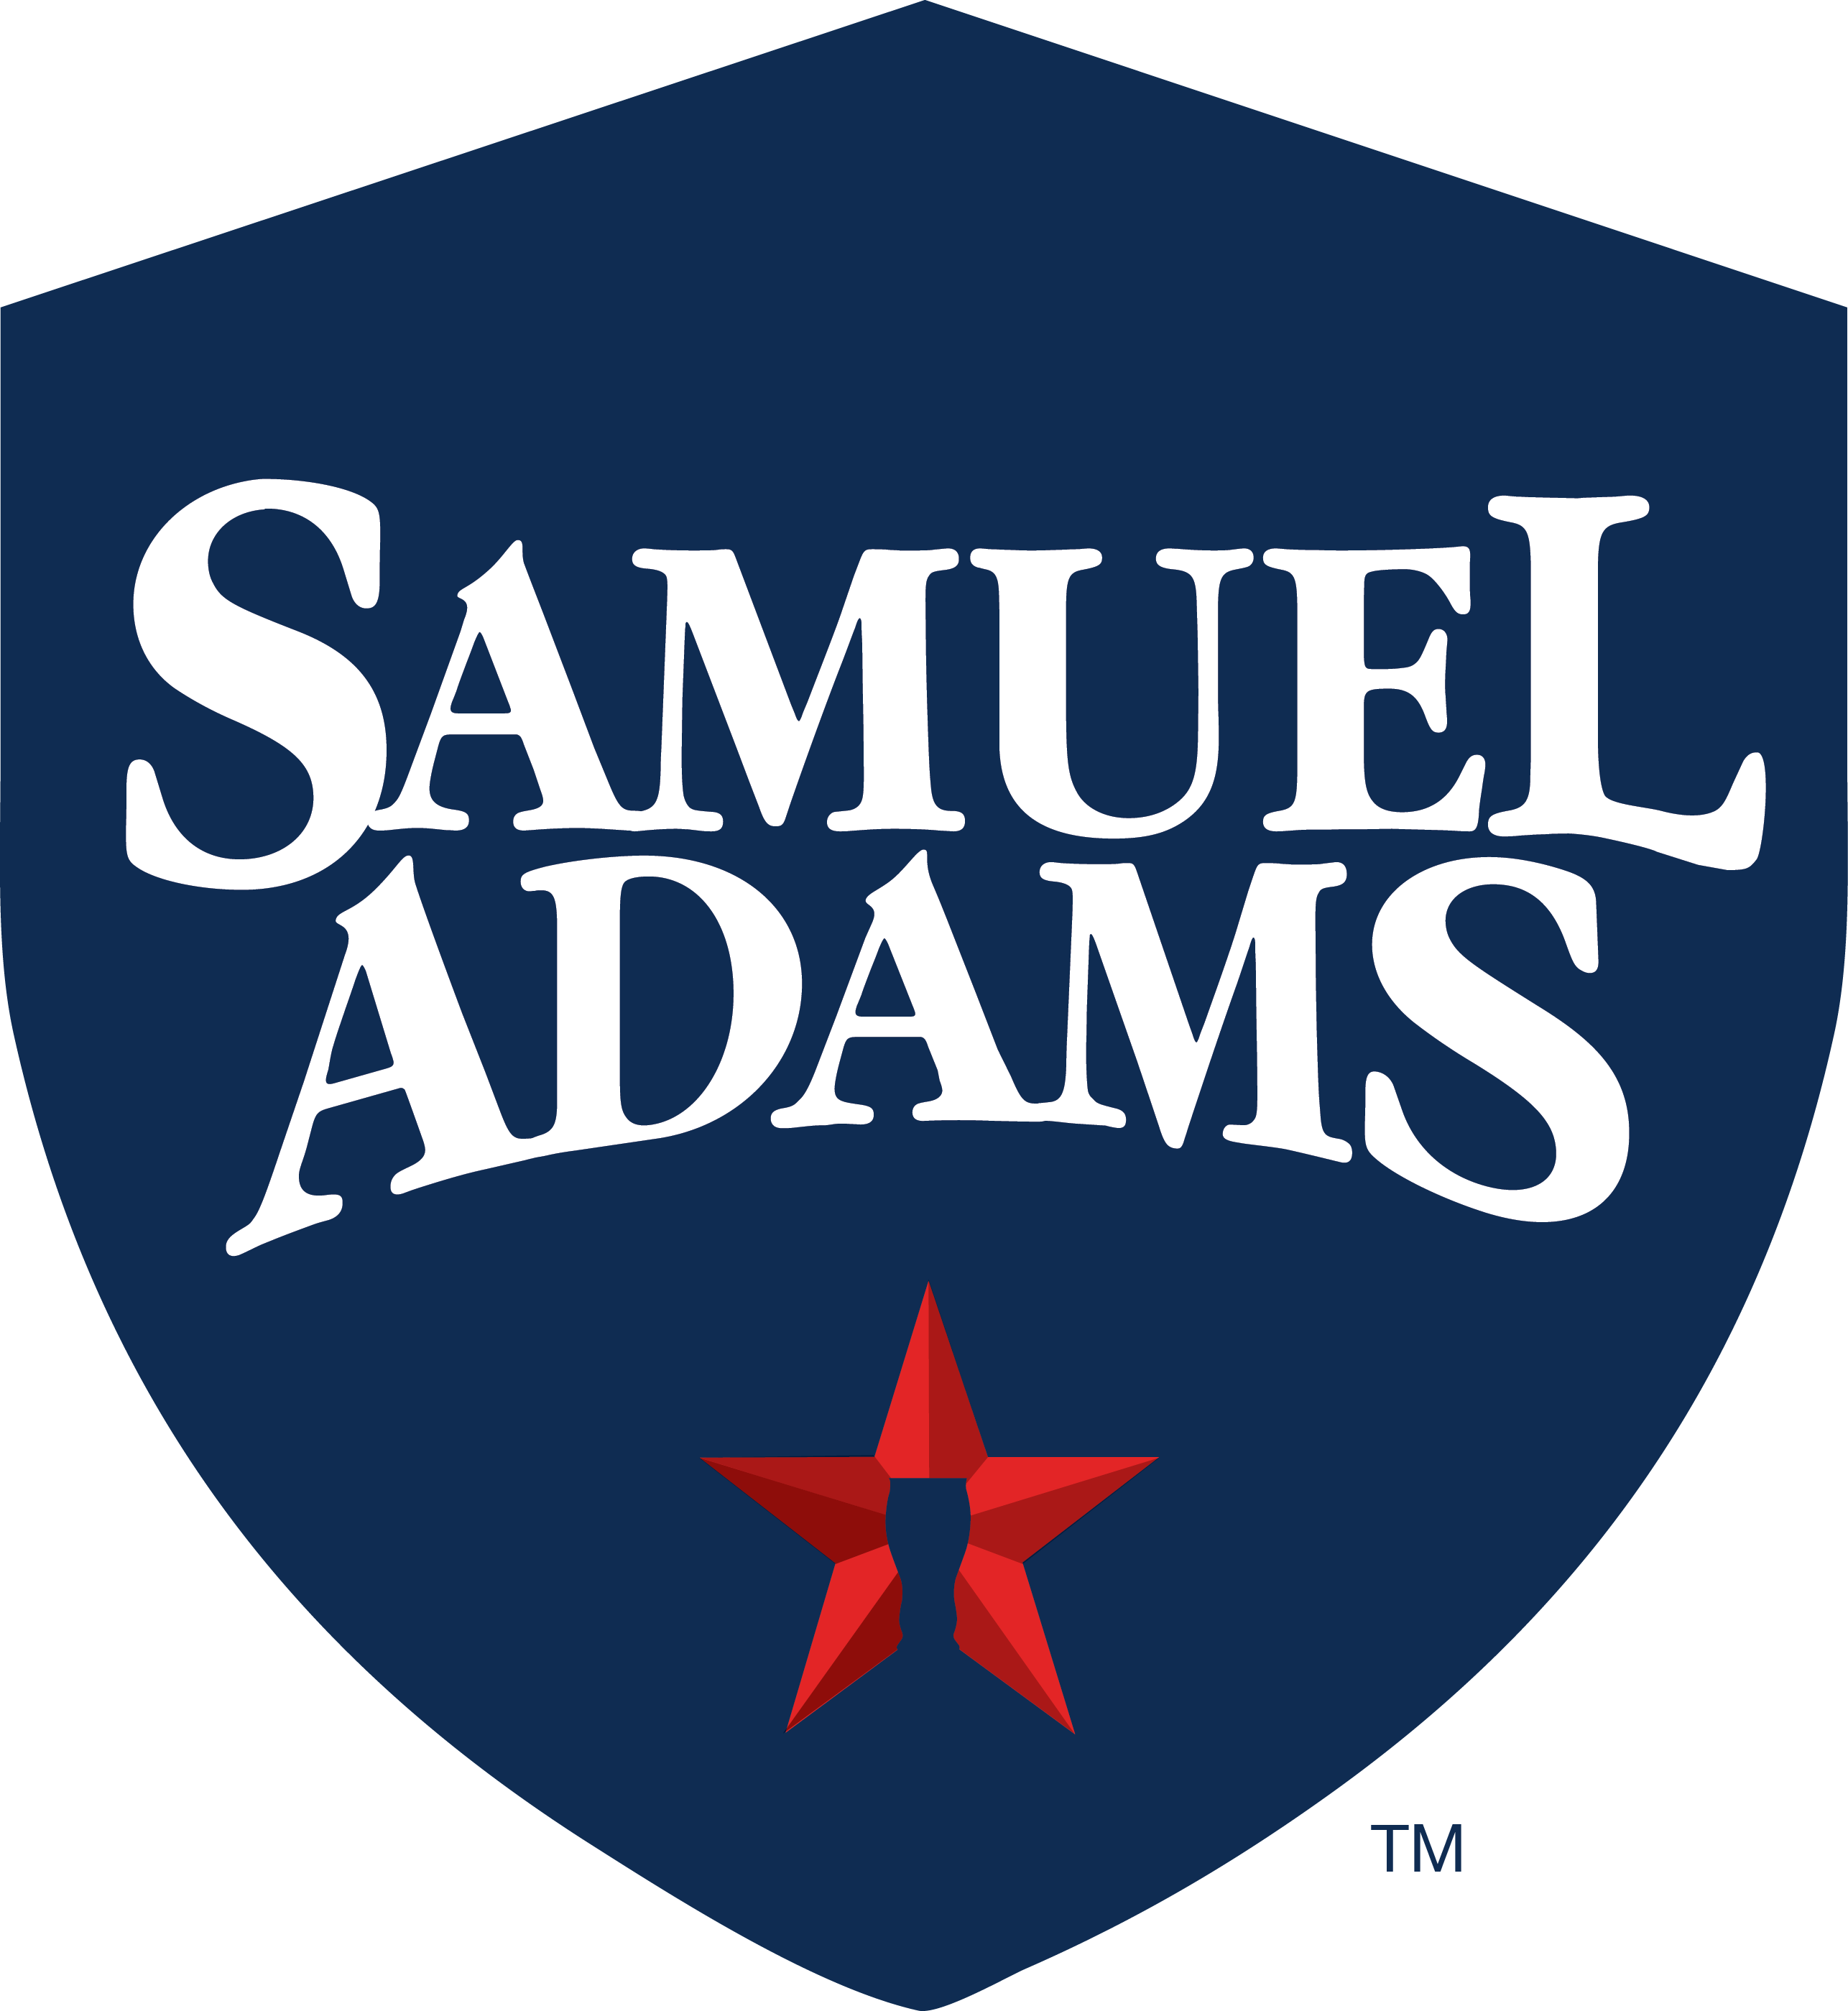 Samuel Adams bryggeri logga